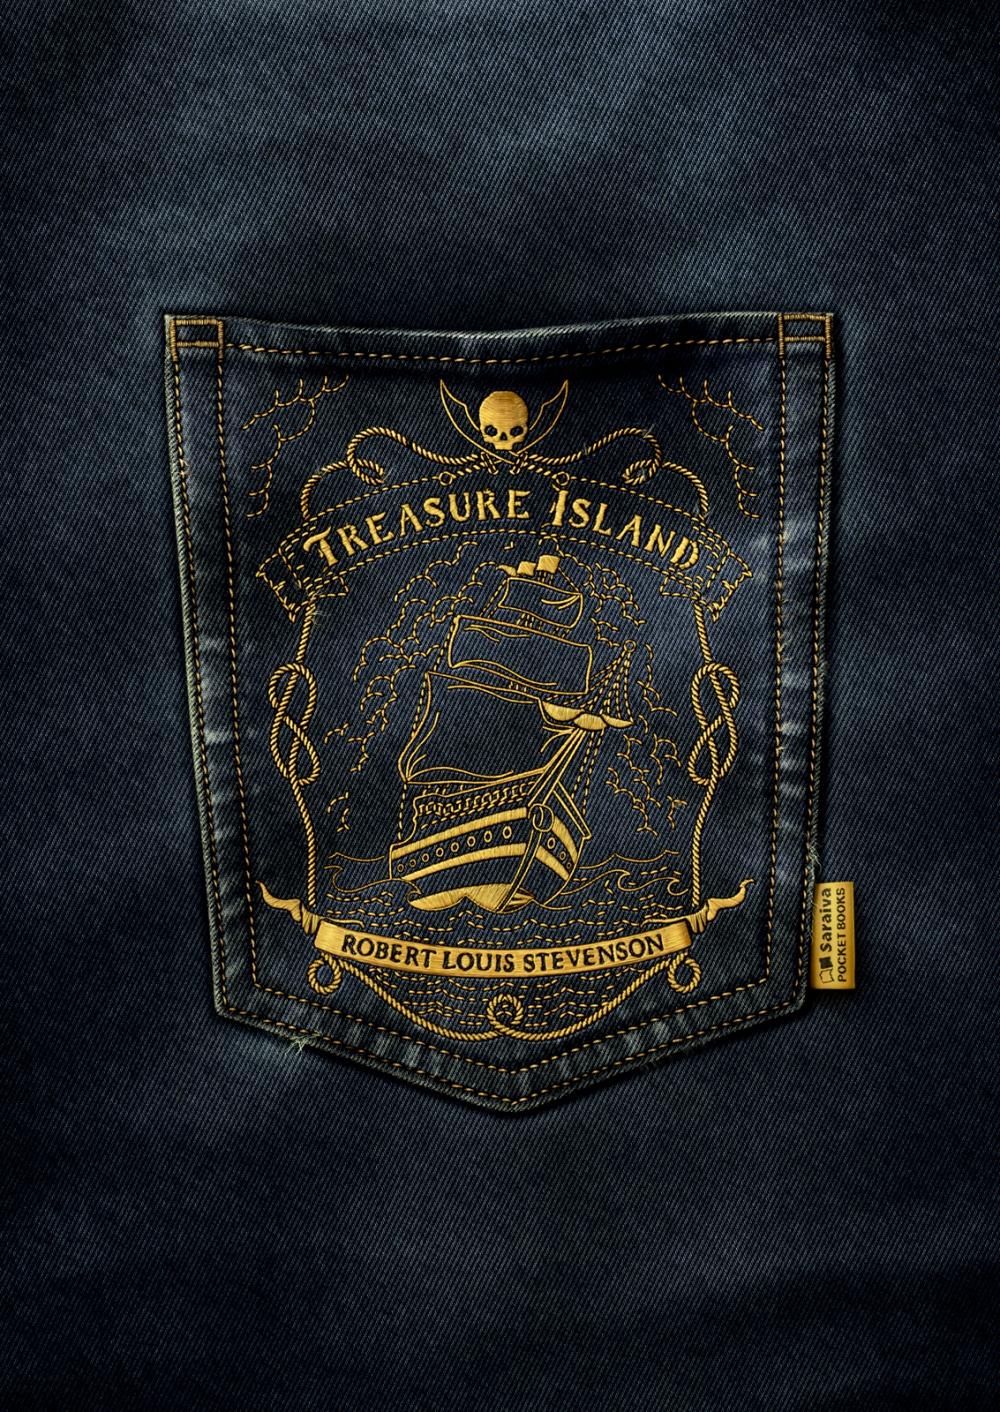 Treasure island - Saraiva - outdoor